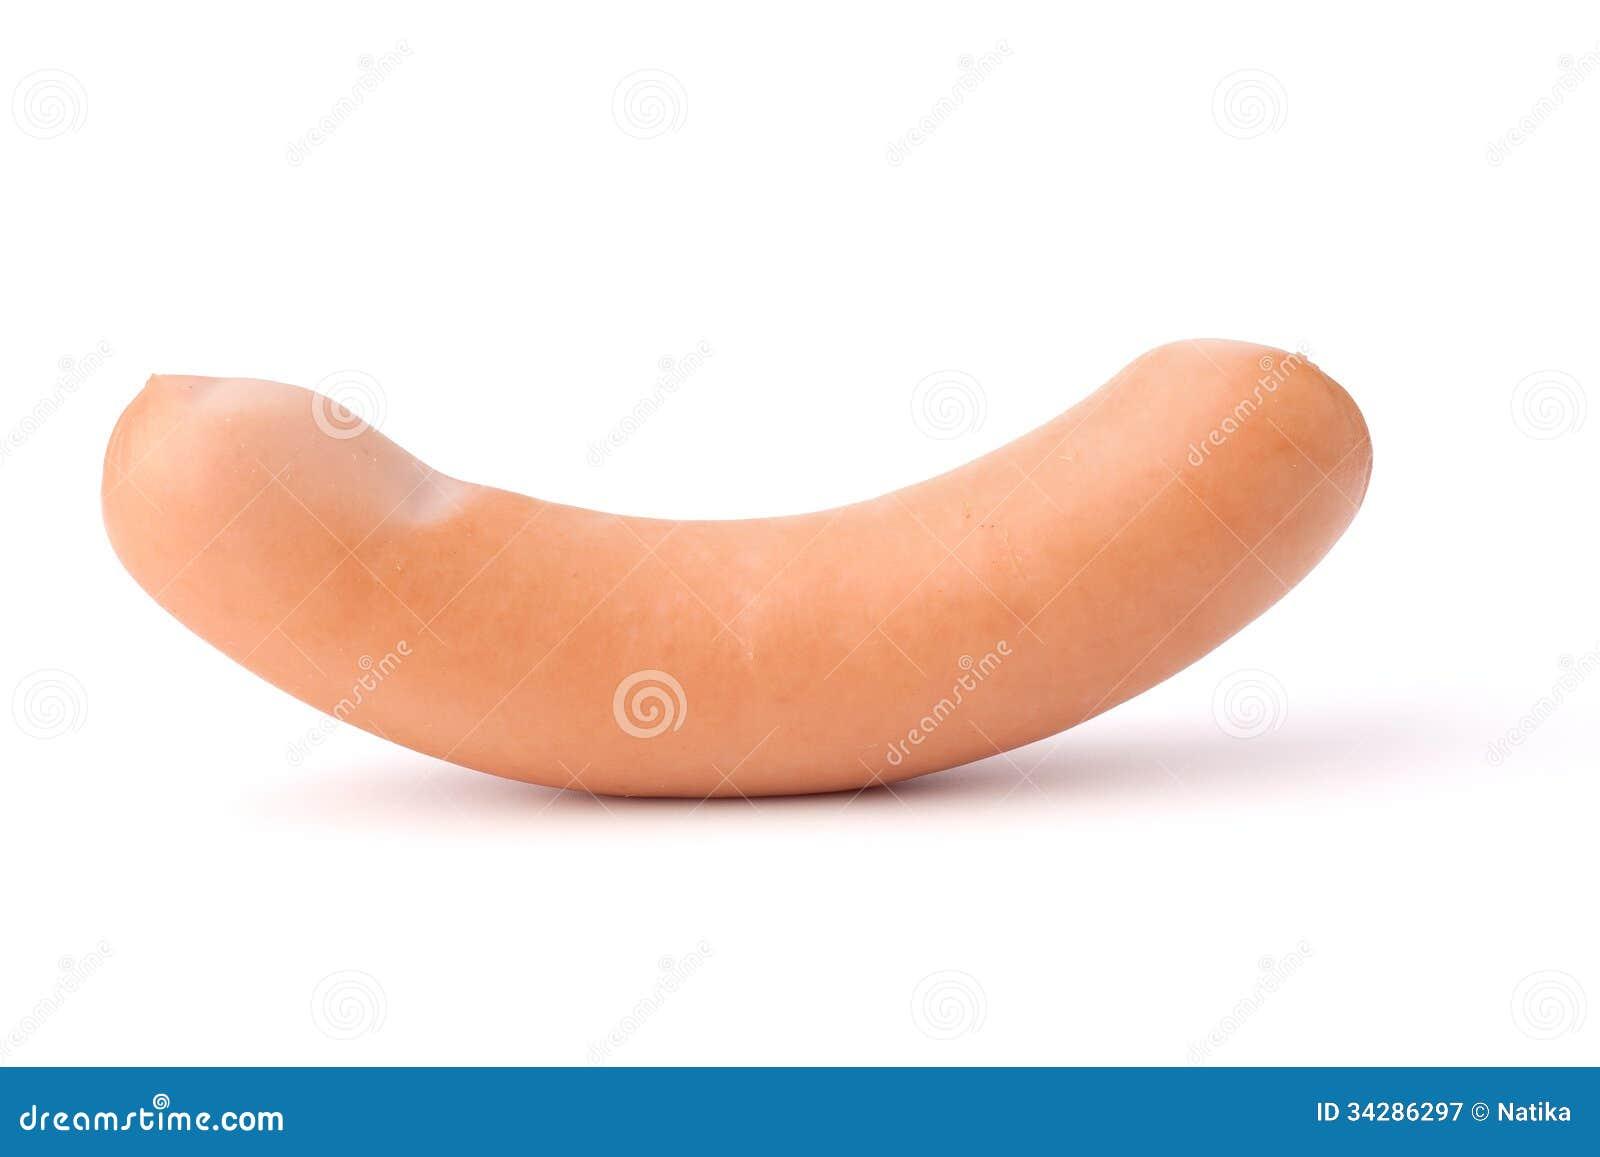 Frankfurter Sausage Royalty Free Stock Photography - Image: 34286297